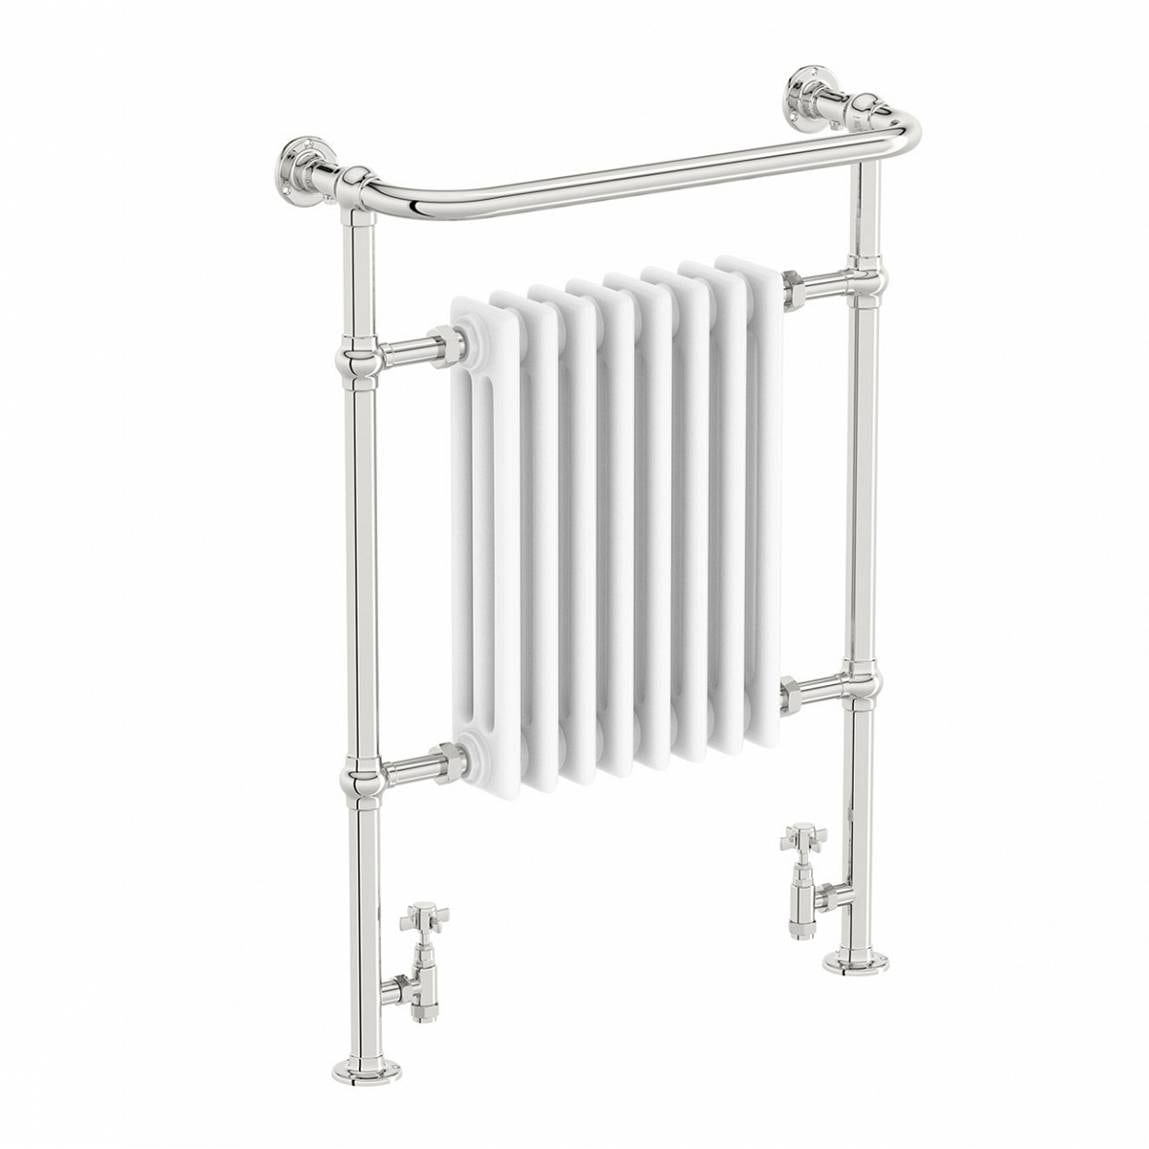 The Bath Co. Dulwich traditional radiator 952 x 659